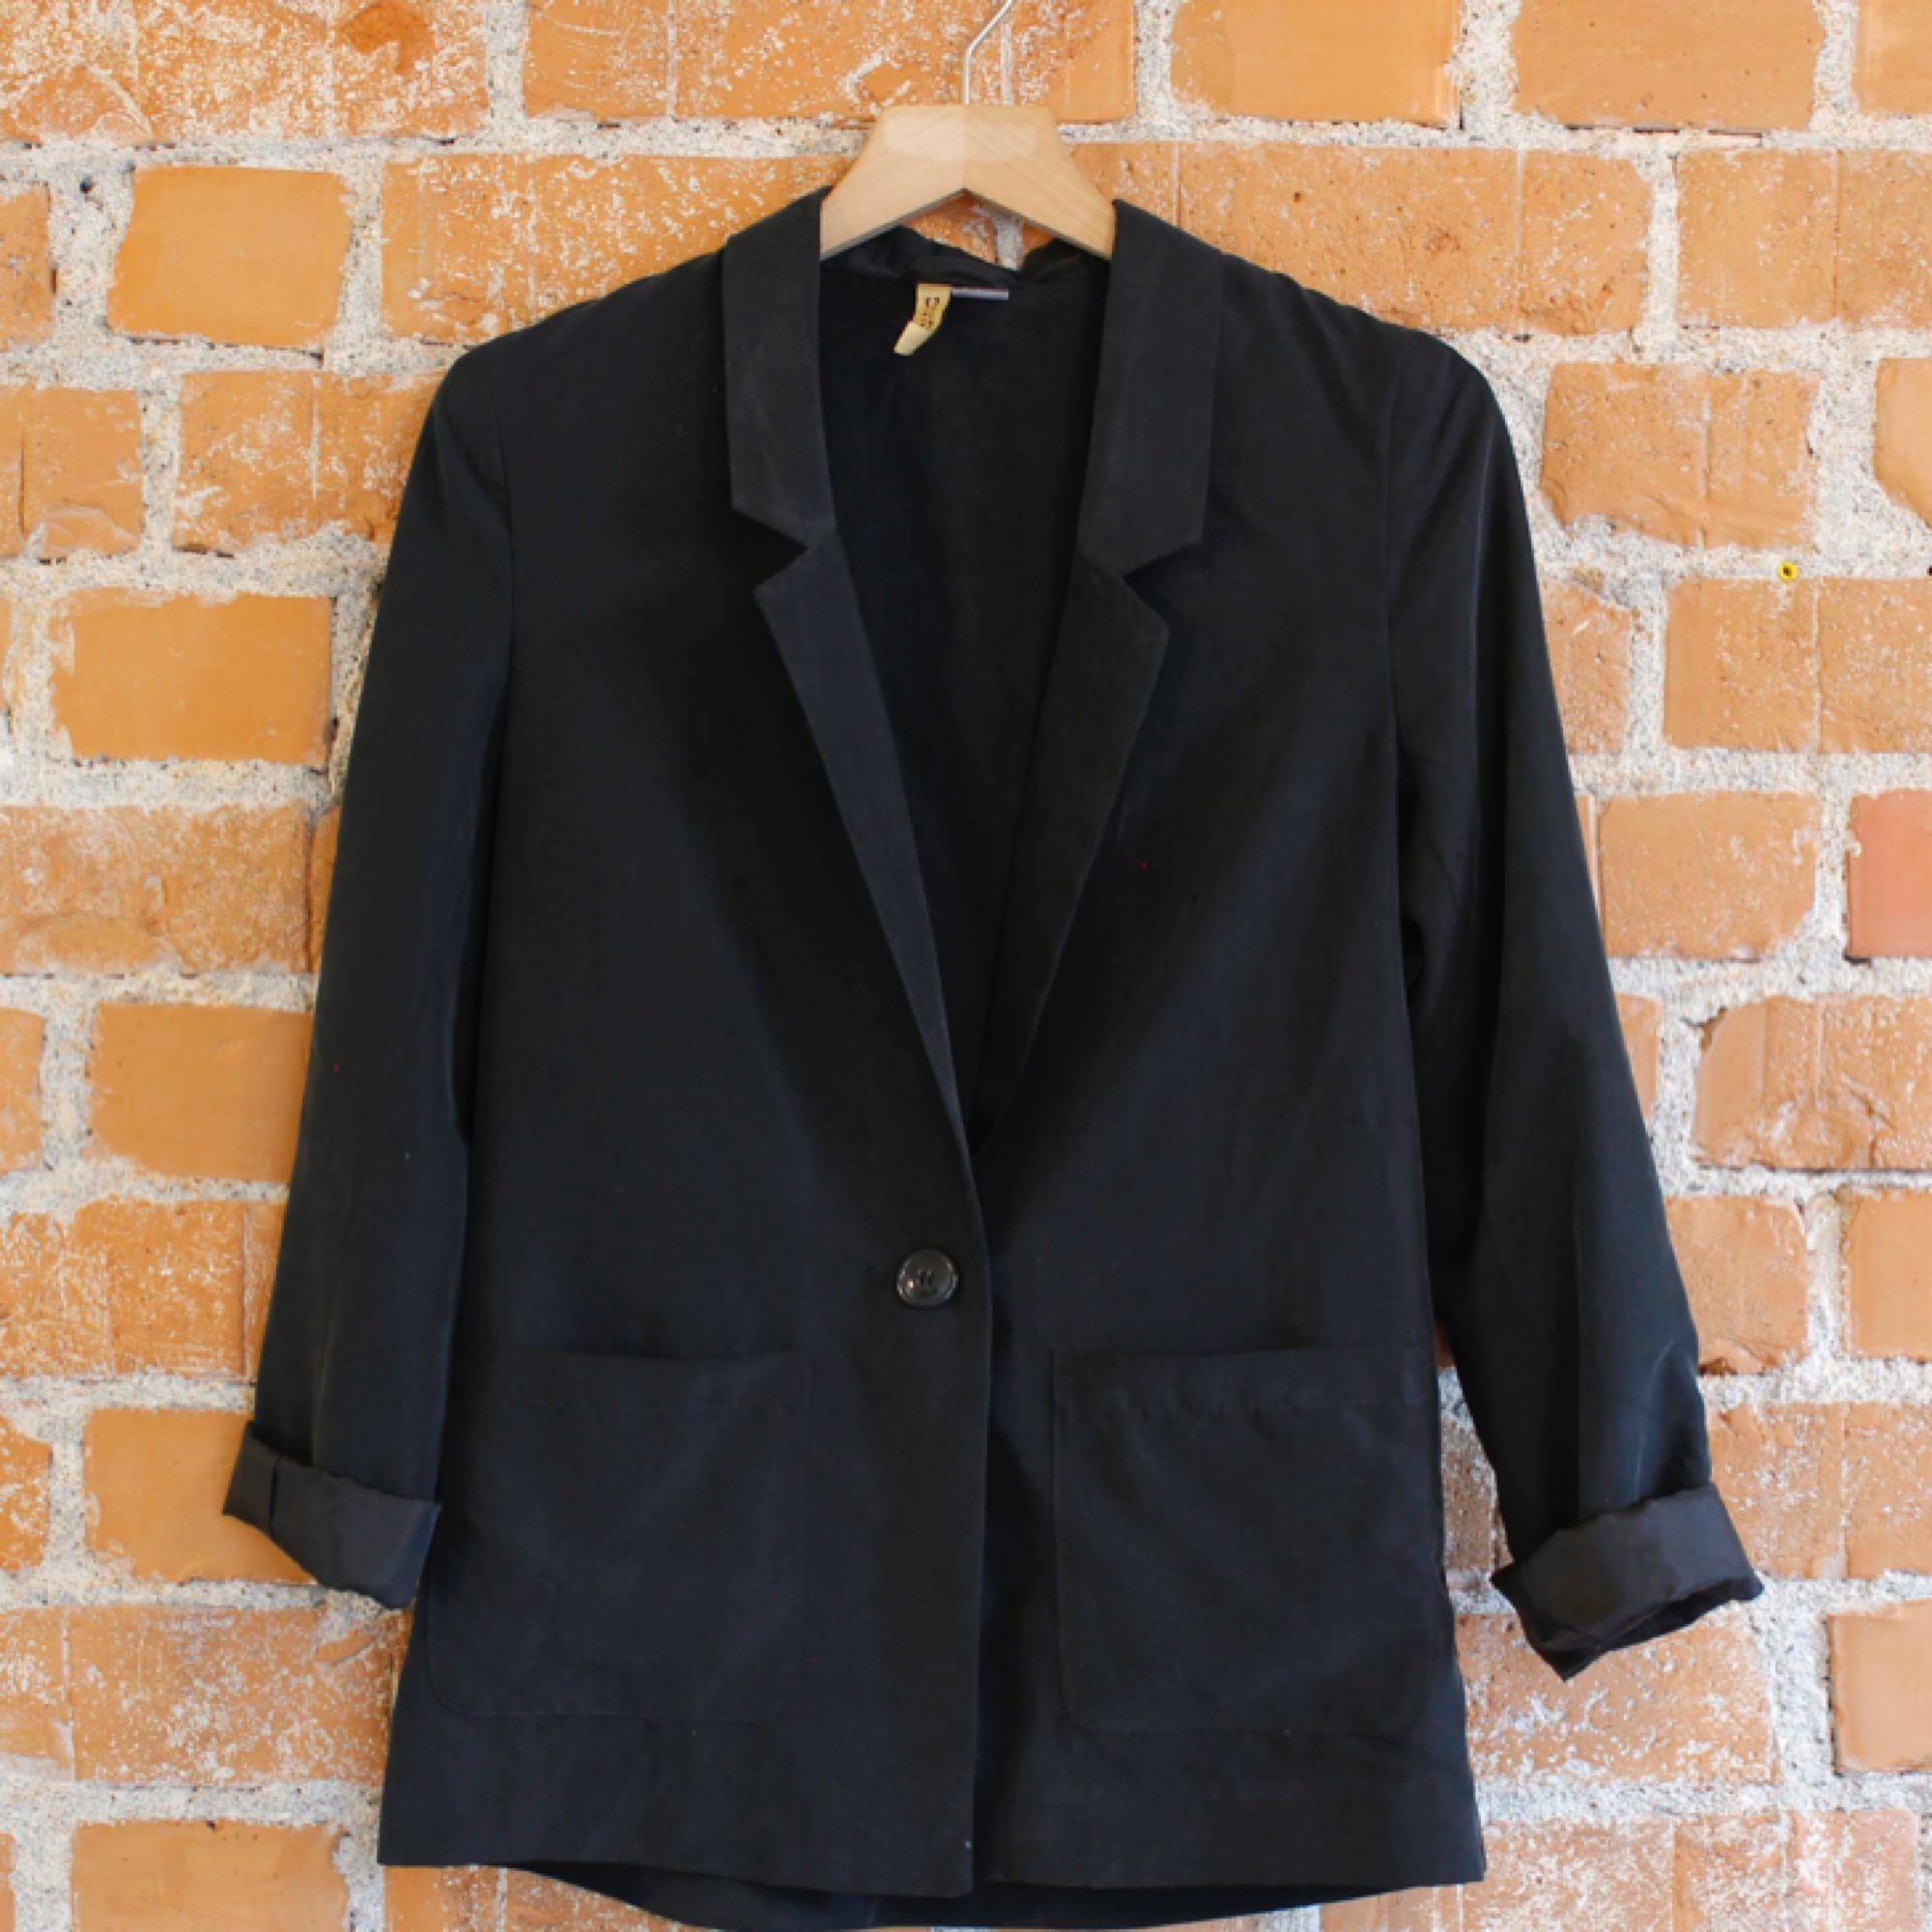 Grå Kavaj från HM, strl 36, fint skick. Frakt 36kr 70%modal 30% polyester. Kostymer.